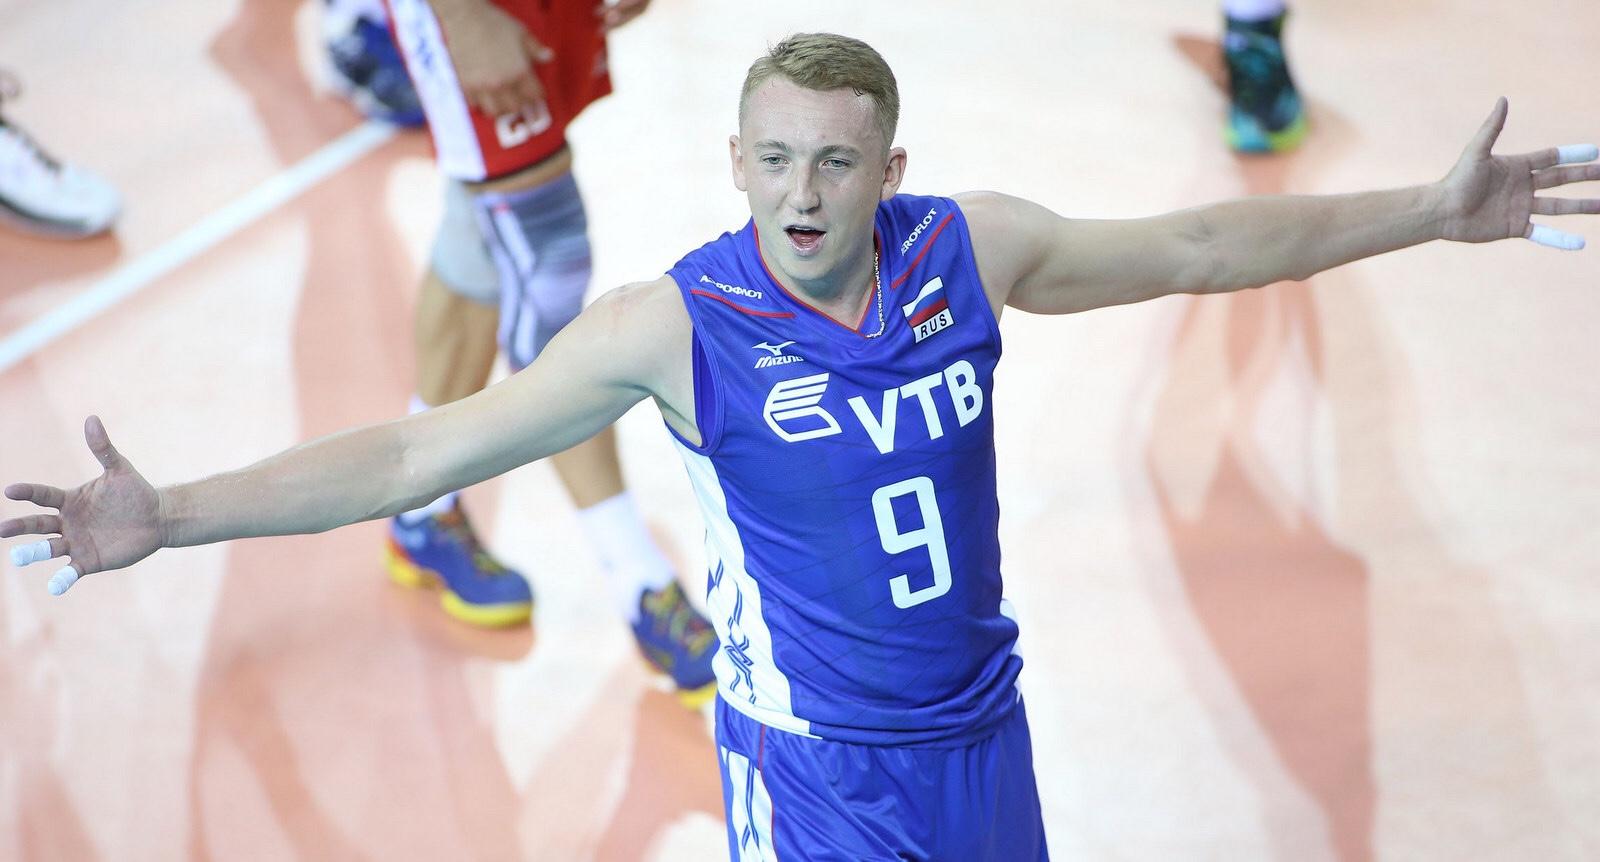 #Transfers: Spiridonov and Alekseev from Kazan to Ural Ufa.